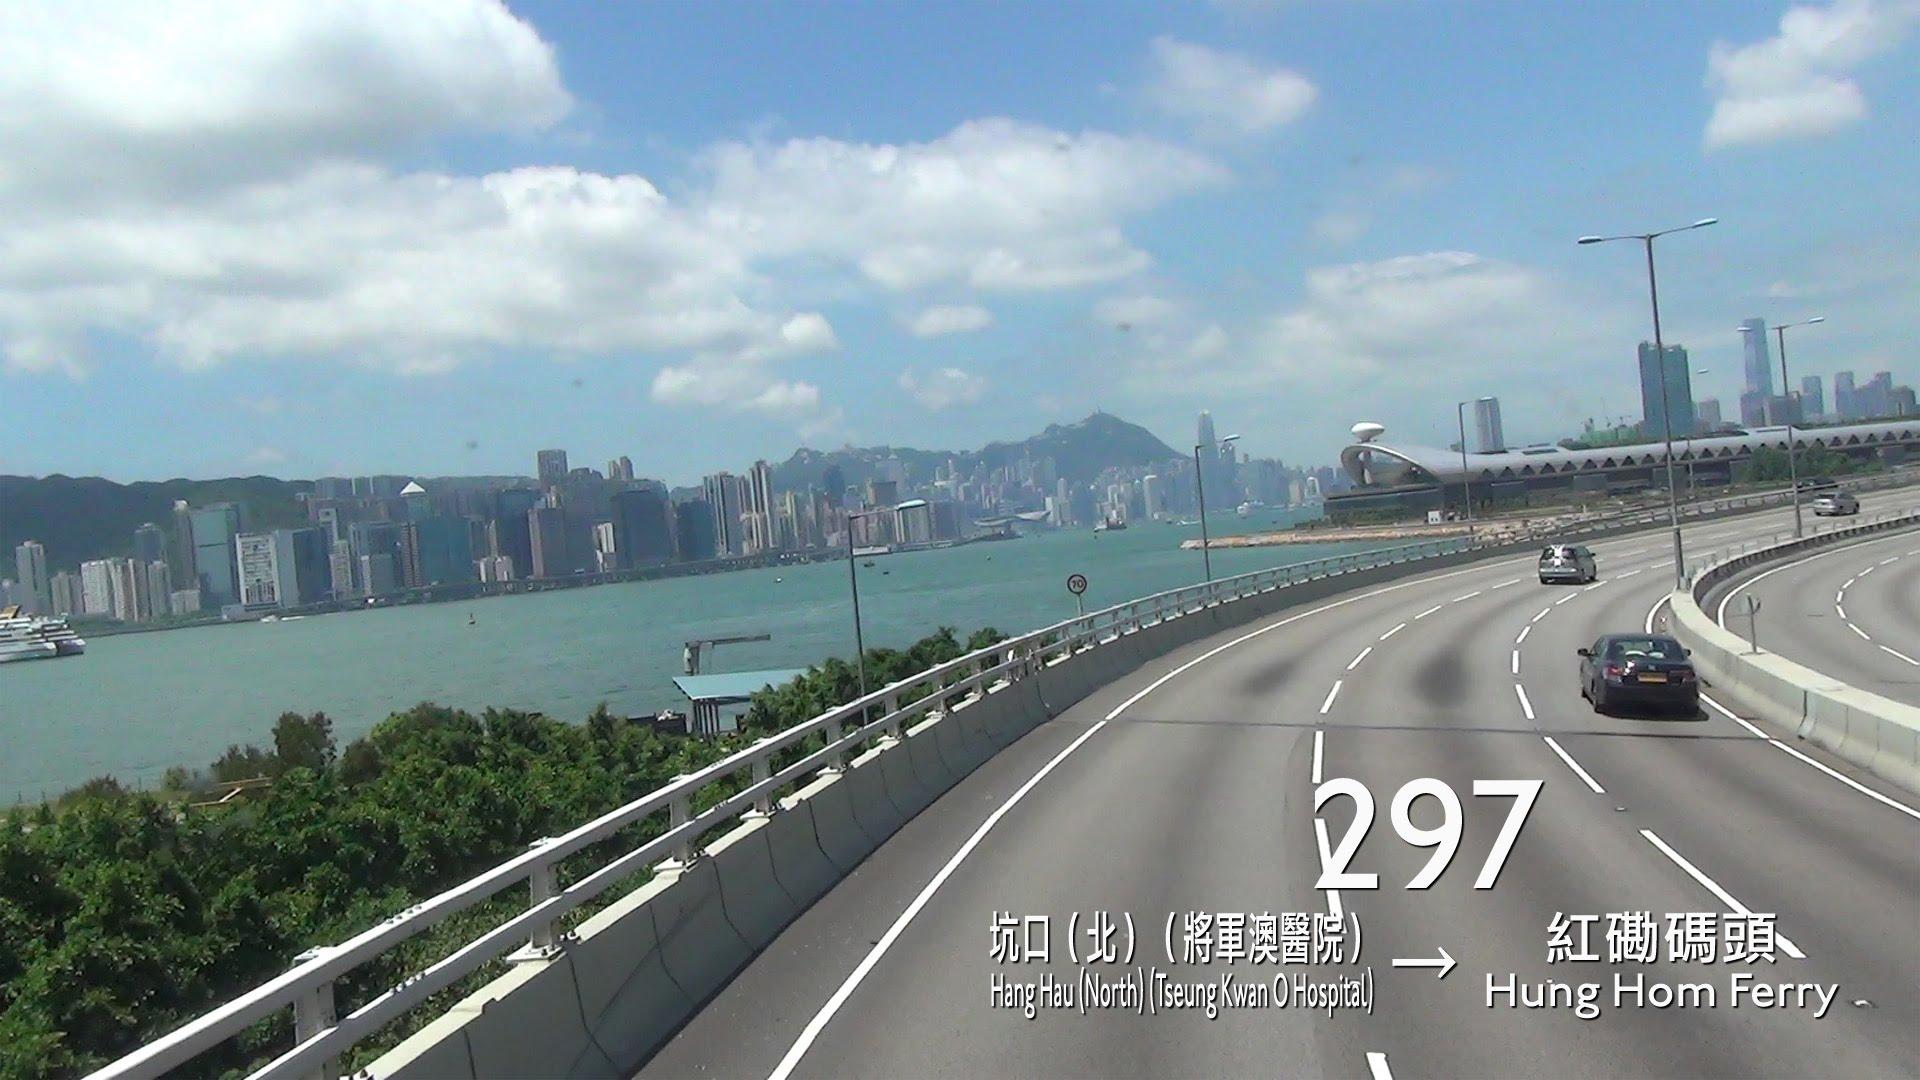 [Hong Kong Bus Ride] 九巴 3AV260 @ 297 往 紅磡碼頭 [全程行車影片]